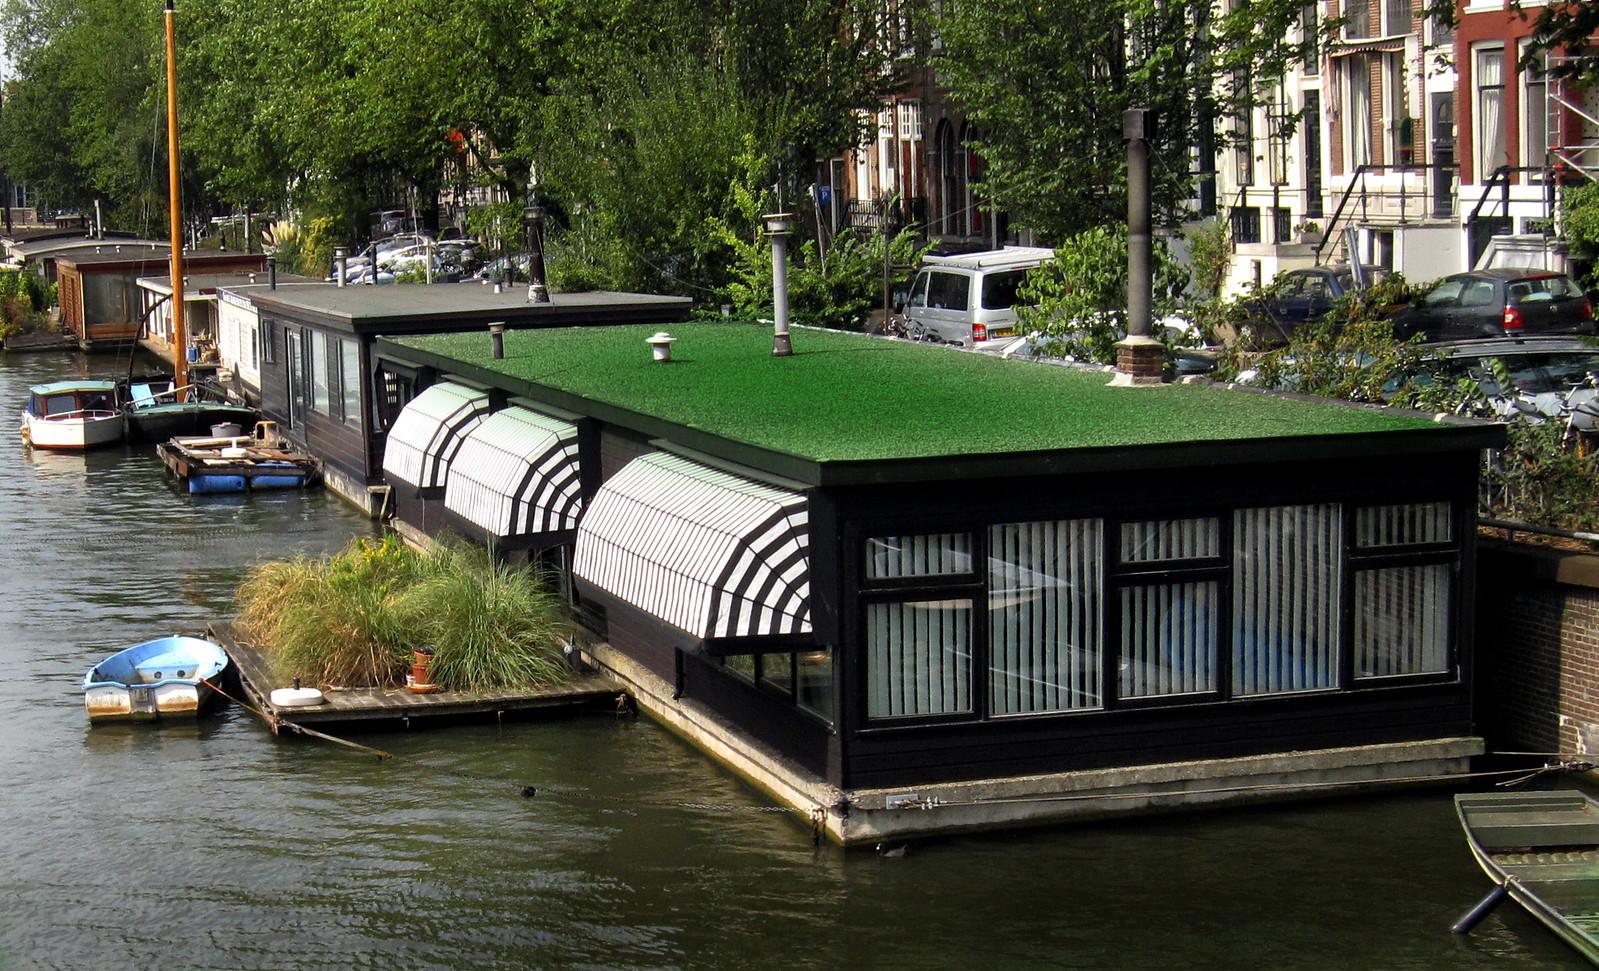 Amsterdam 538